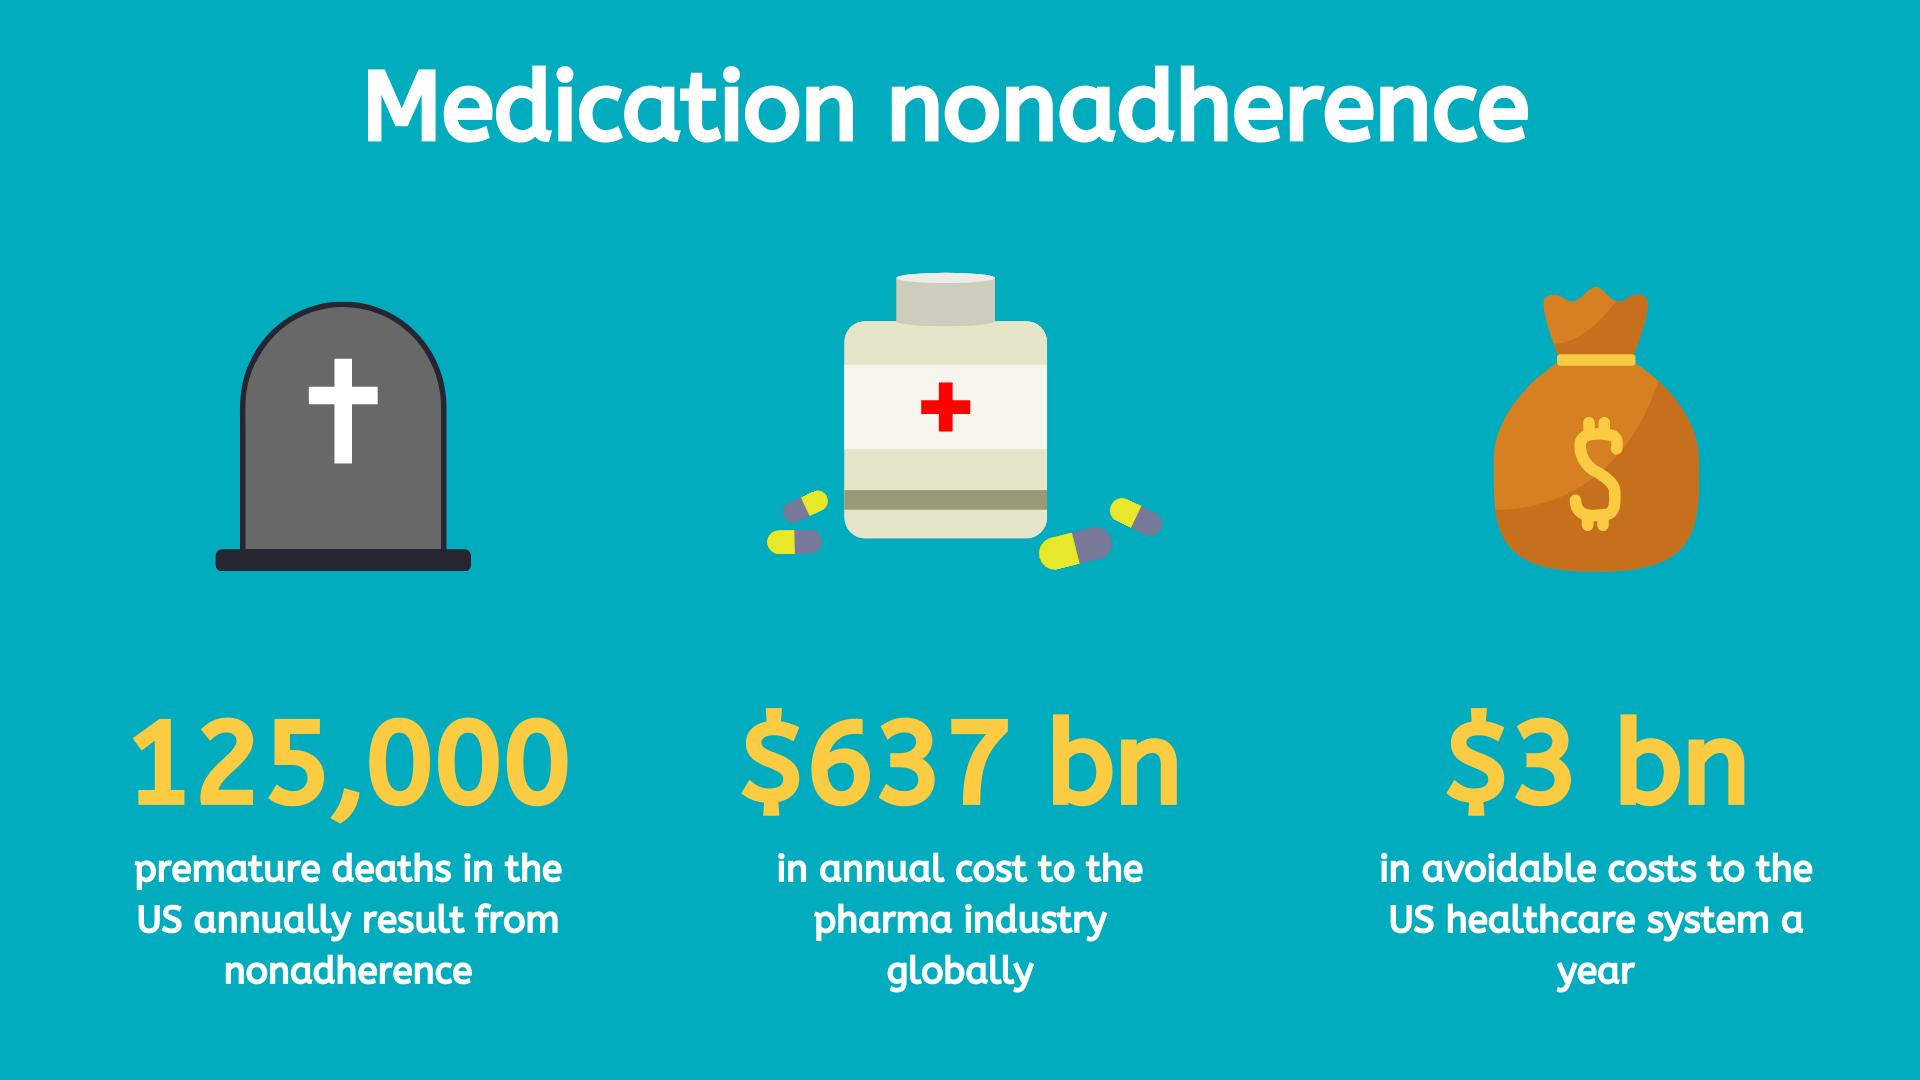 The impact of medication nonadherence.